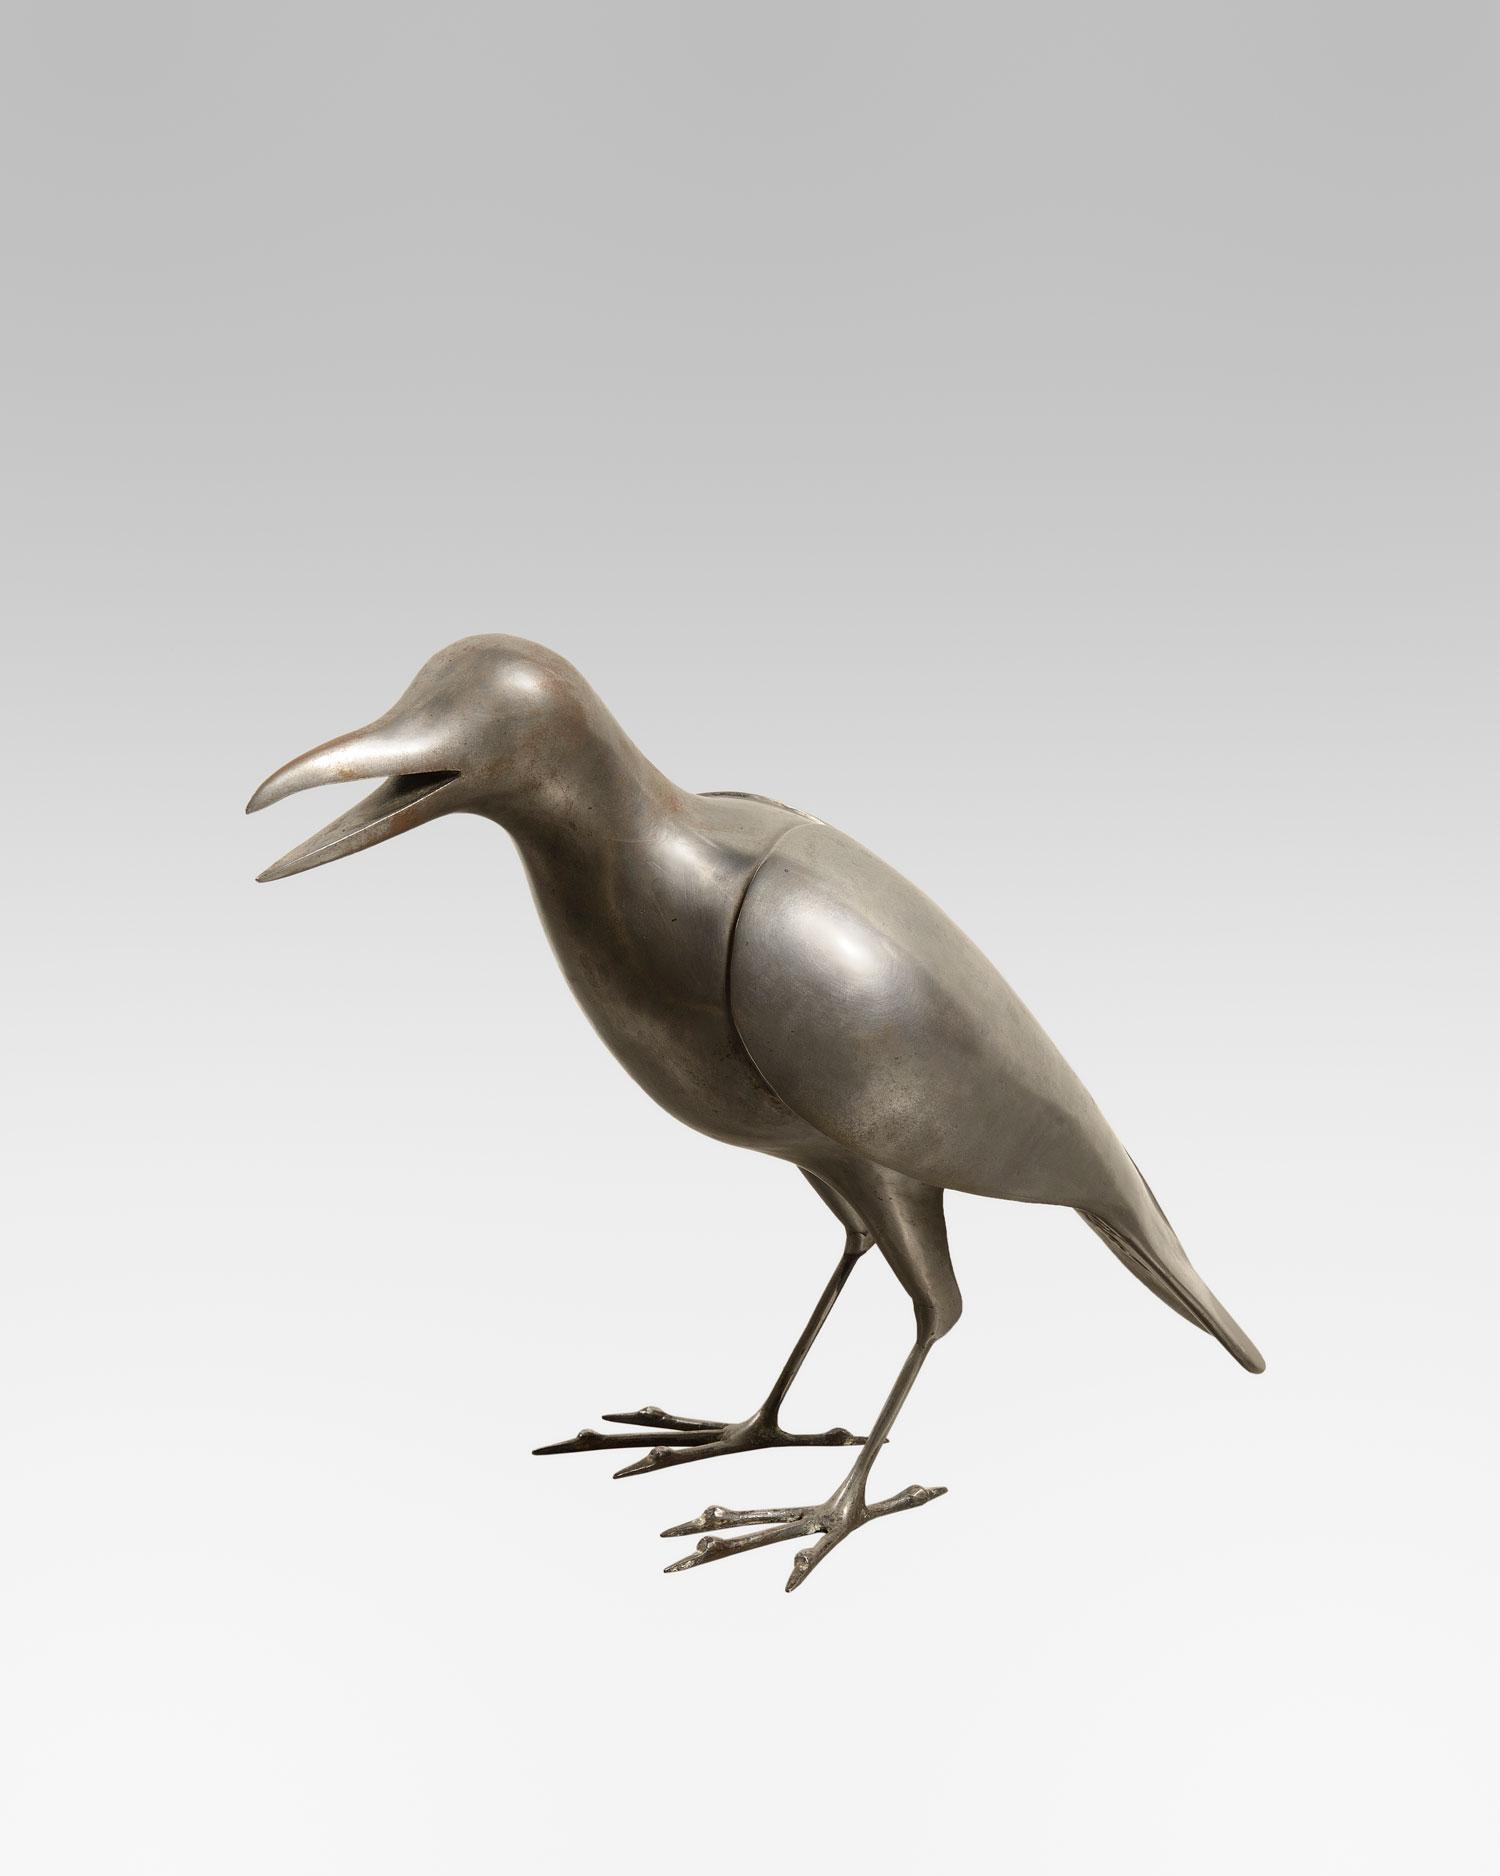 The Best of Modern Sculpture at PAD Geneve 2019 René Broissand - Oiseau PAD Geneve The Best of Modern Sculpture at PAD Geneve 2019: René Broissand The Best of Modern Sculpture at PAD Geneve 2019 Ren   Broissand Oiseau